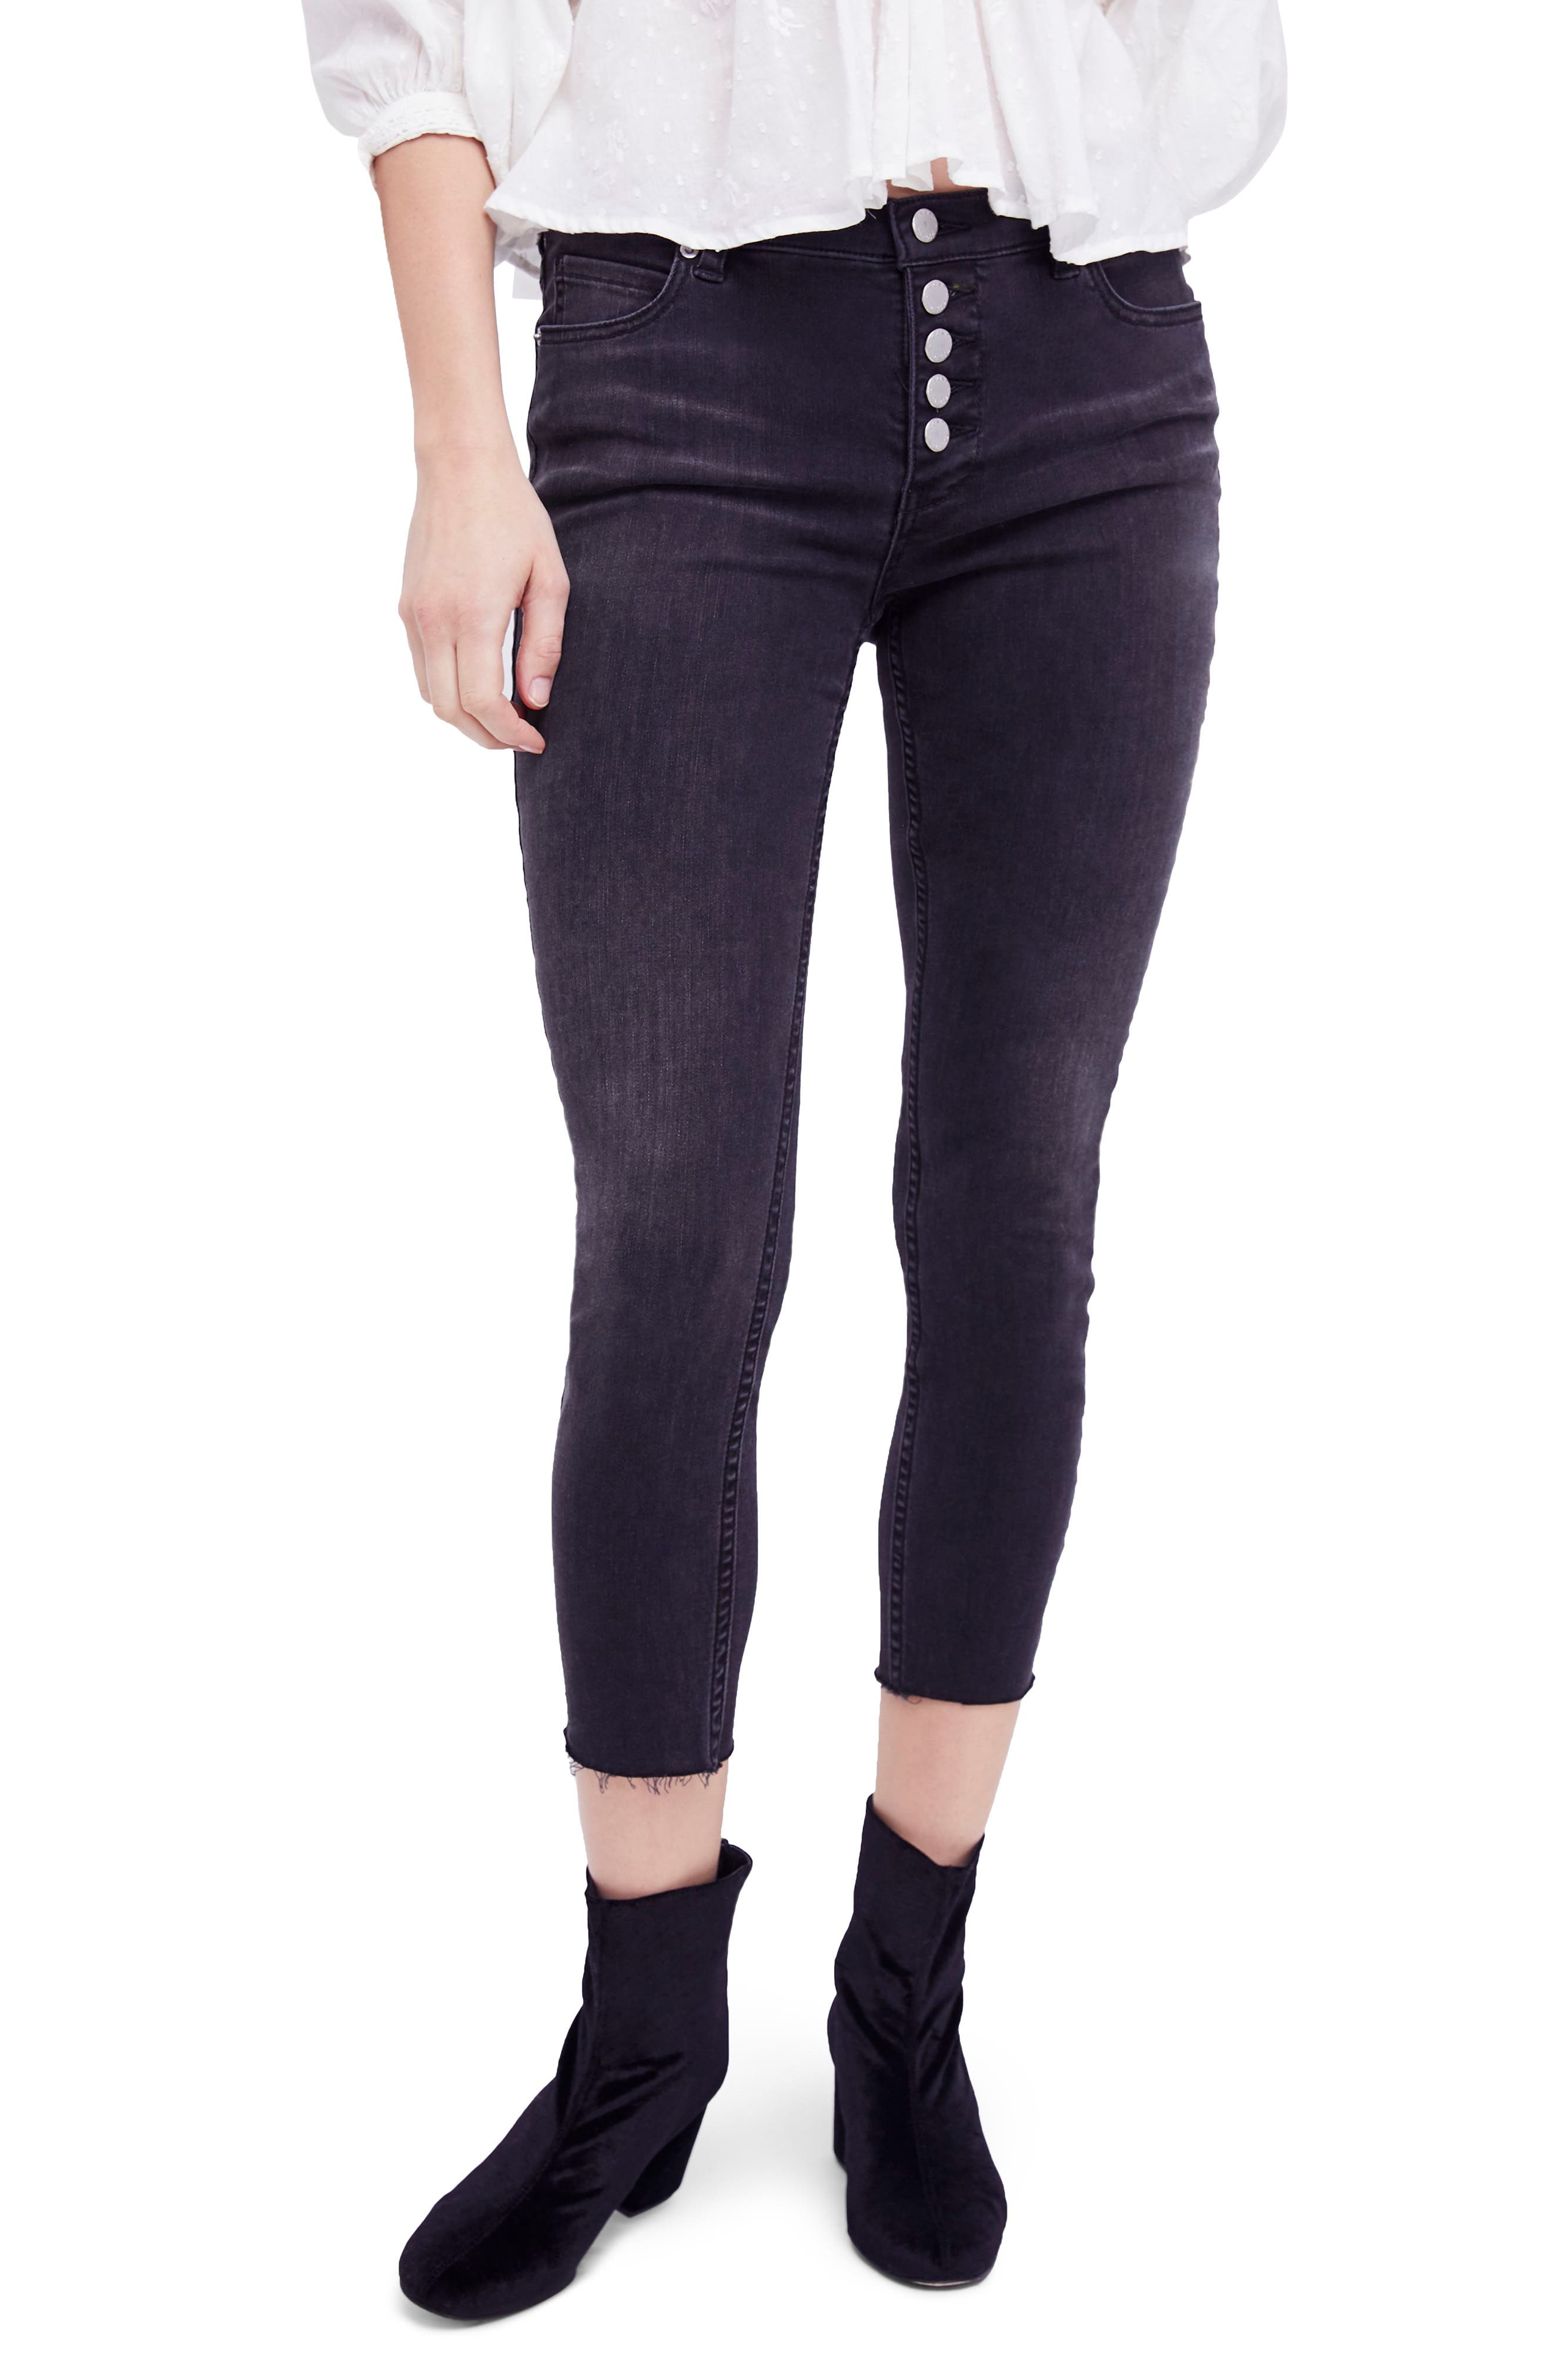 Reagan Crop Skinny Jeans,                             Main thumbnail 1, color,                             Black